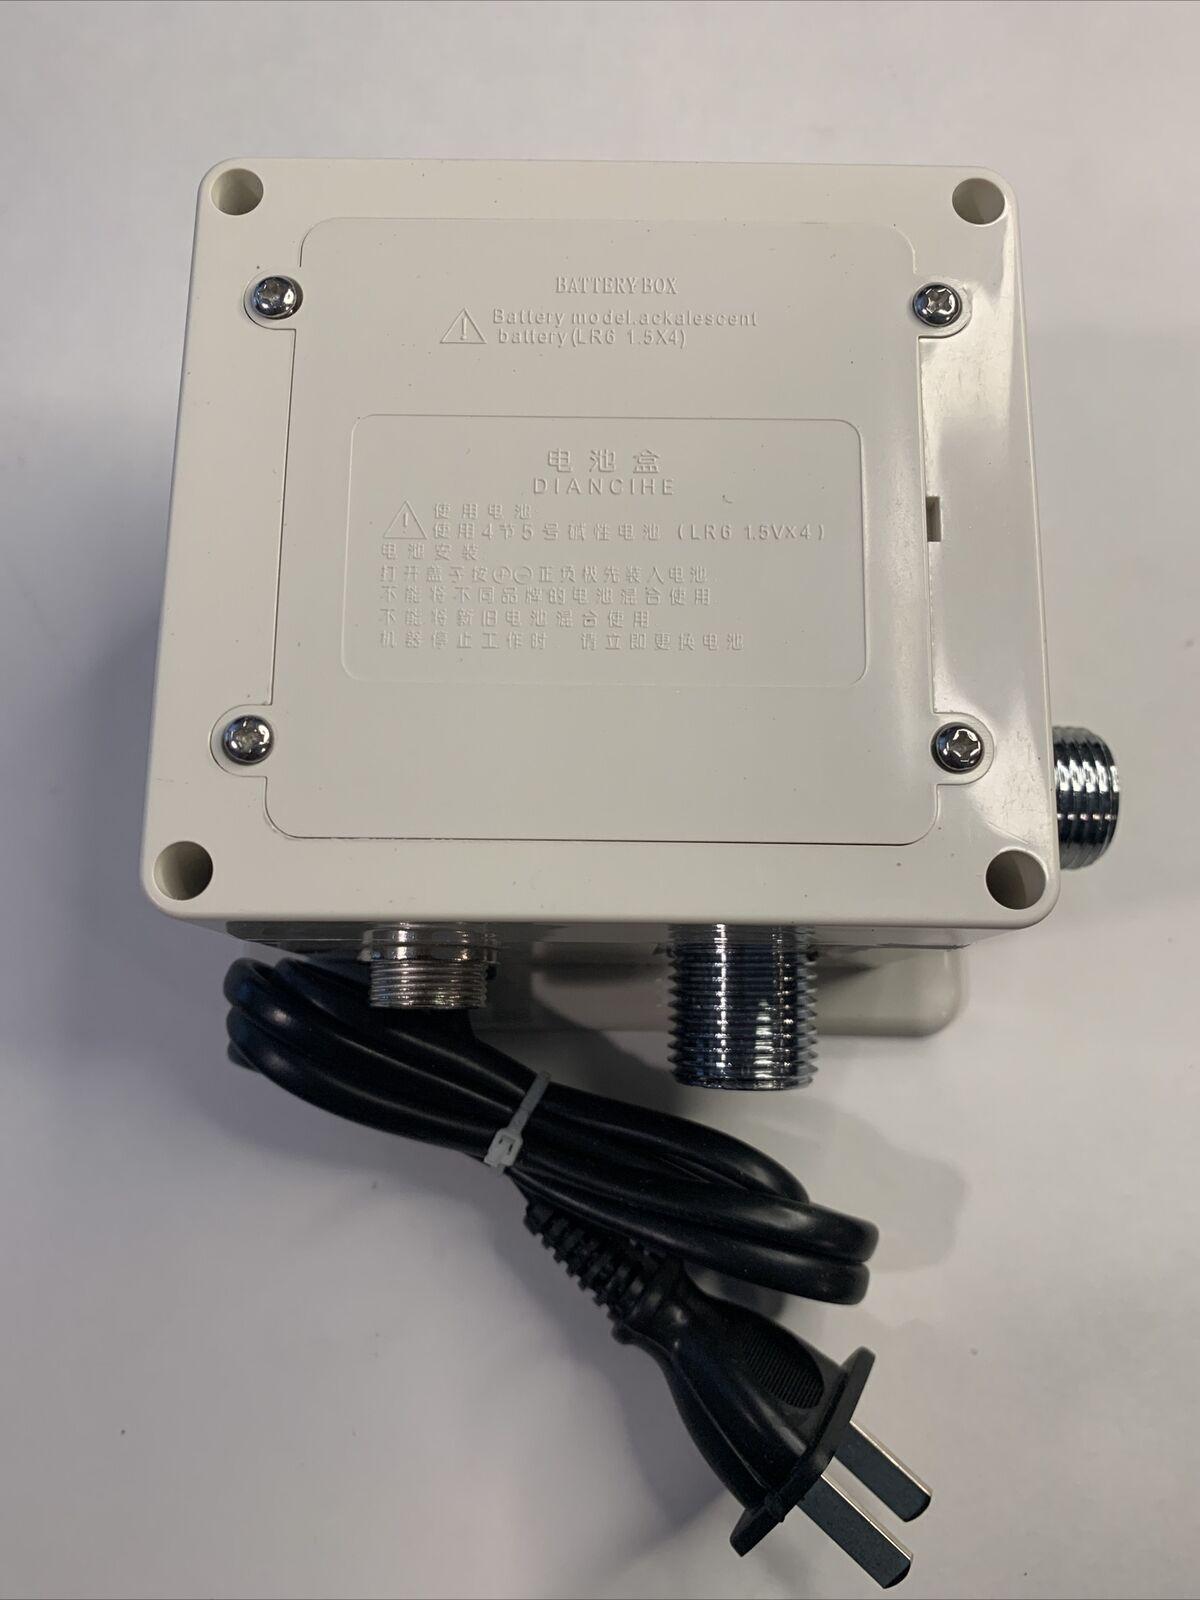 NEW-Battery Box Ackalescent Battery Lr6 1. 5x4 (No Box)